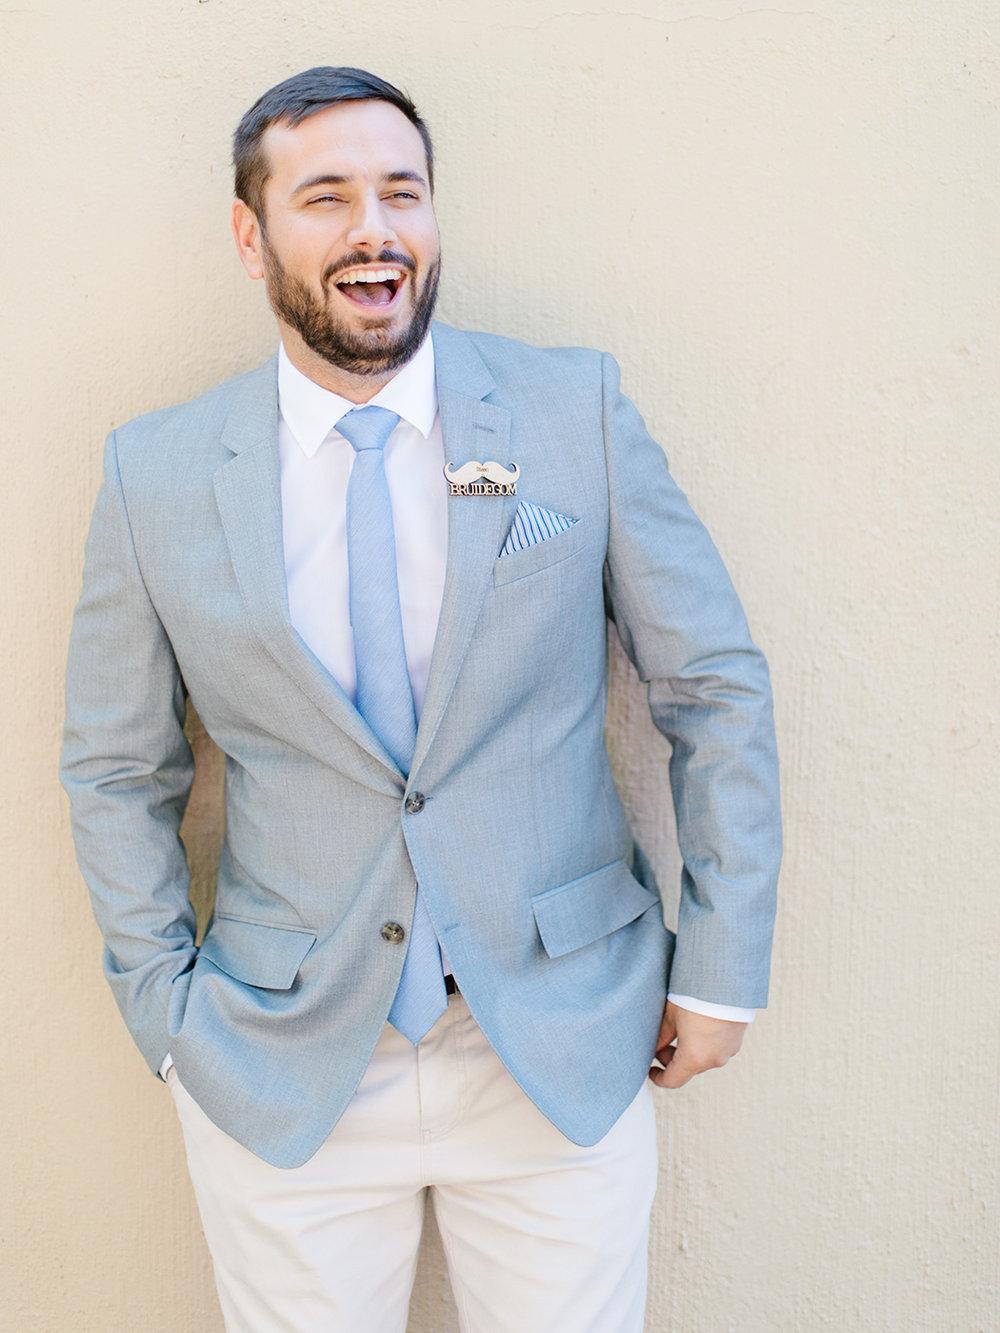 Colorful Hire A Wedding Suit Adornment - Wedding Dress - googeb.com